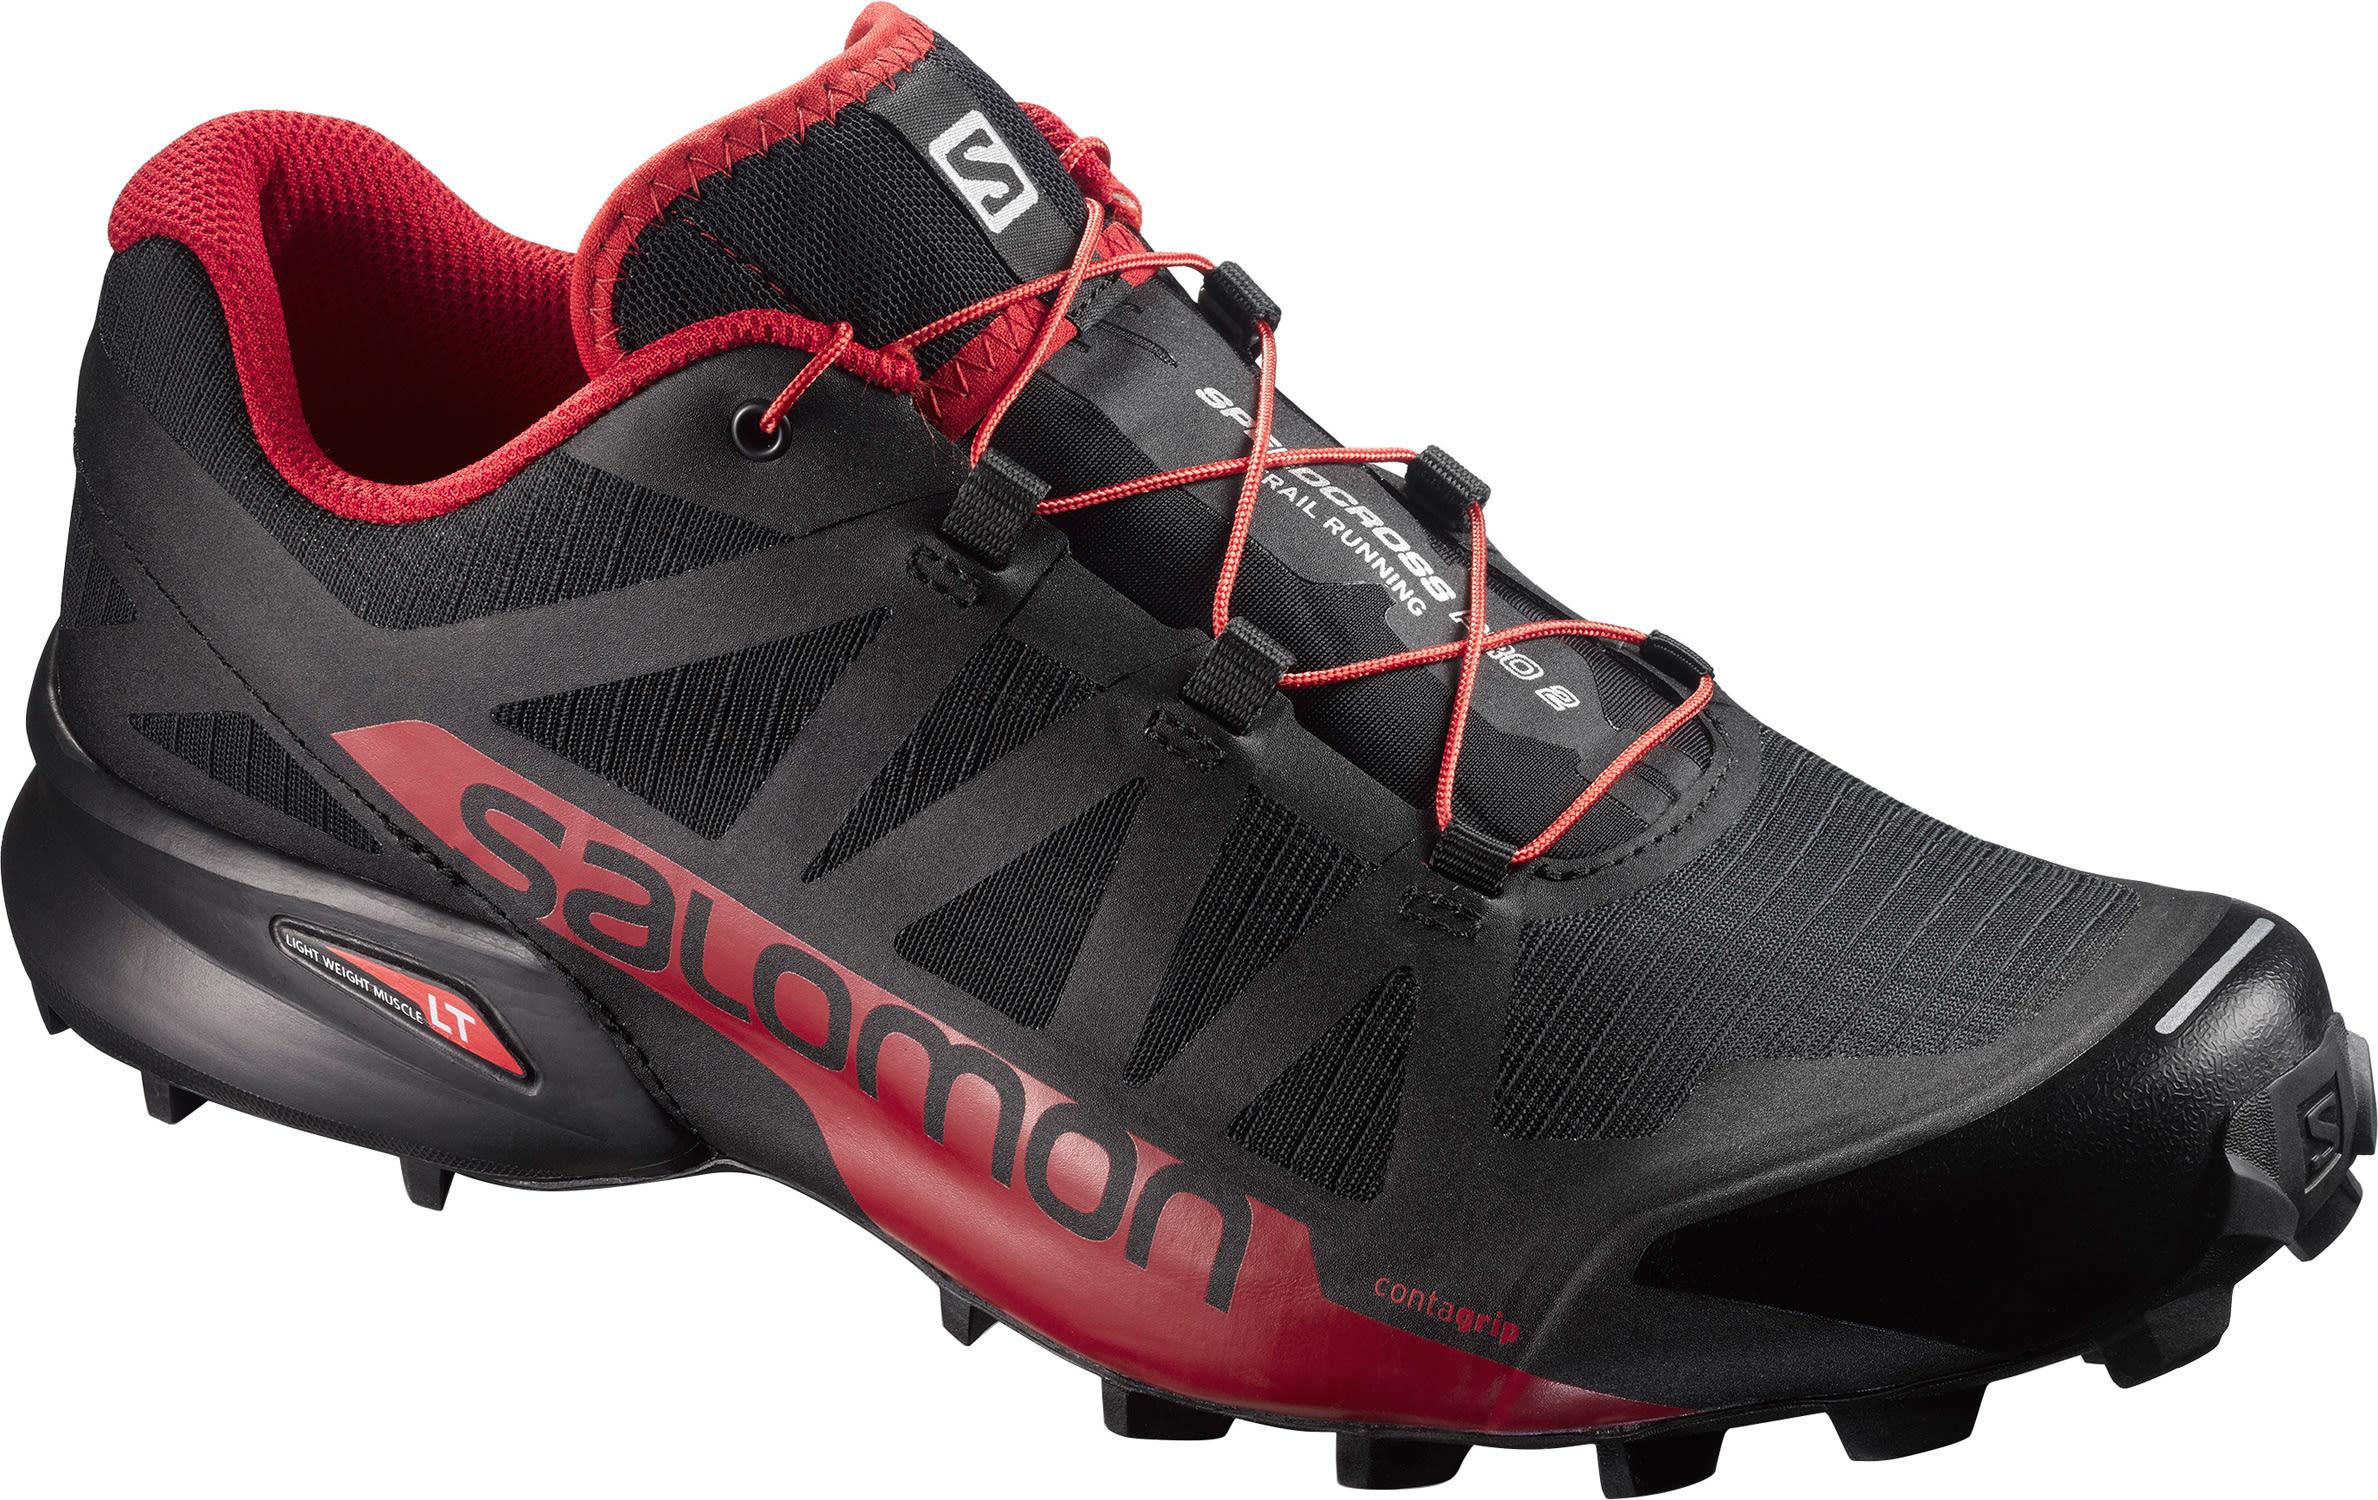 Salomon Speedcross Pro 2 Hiking Shoes 2018